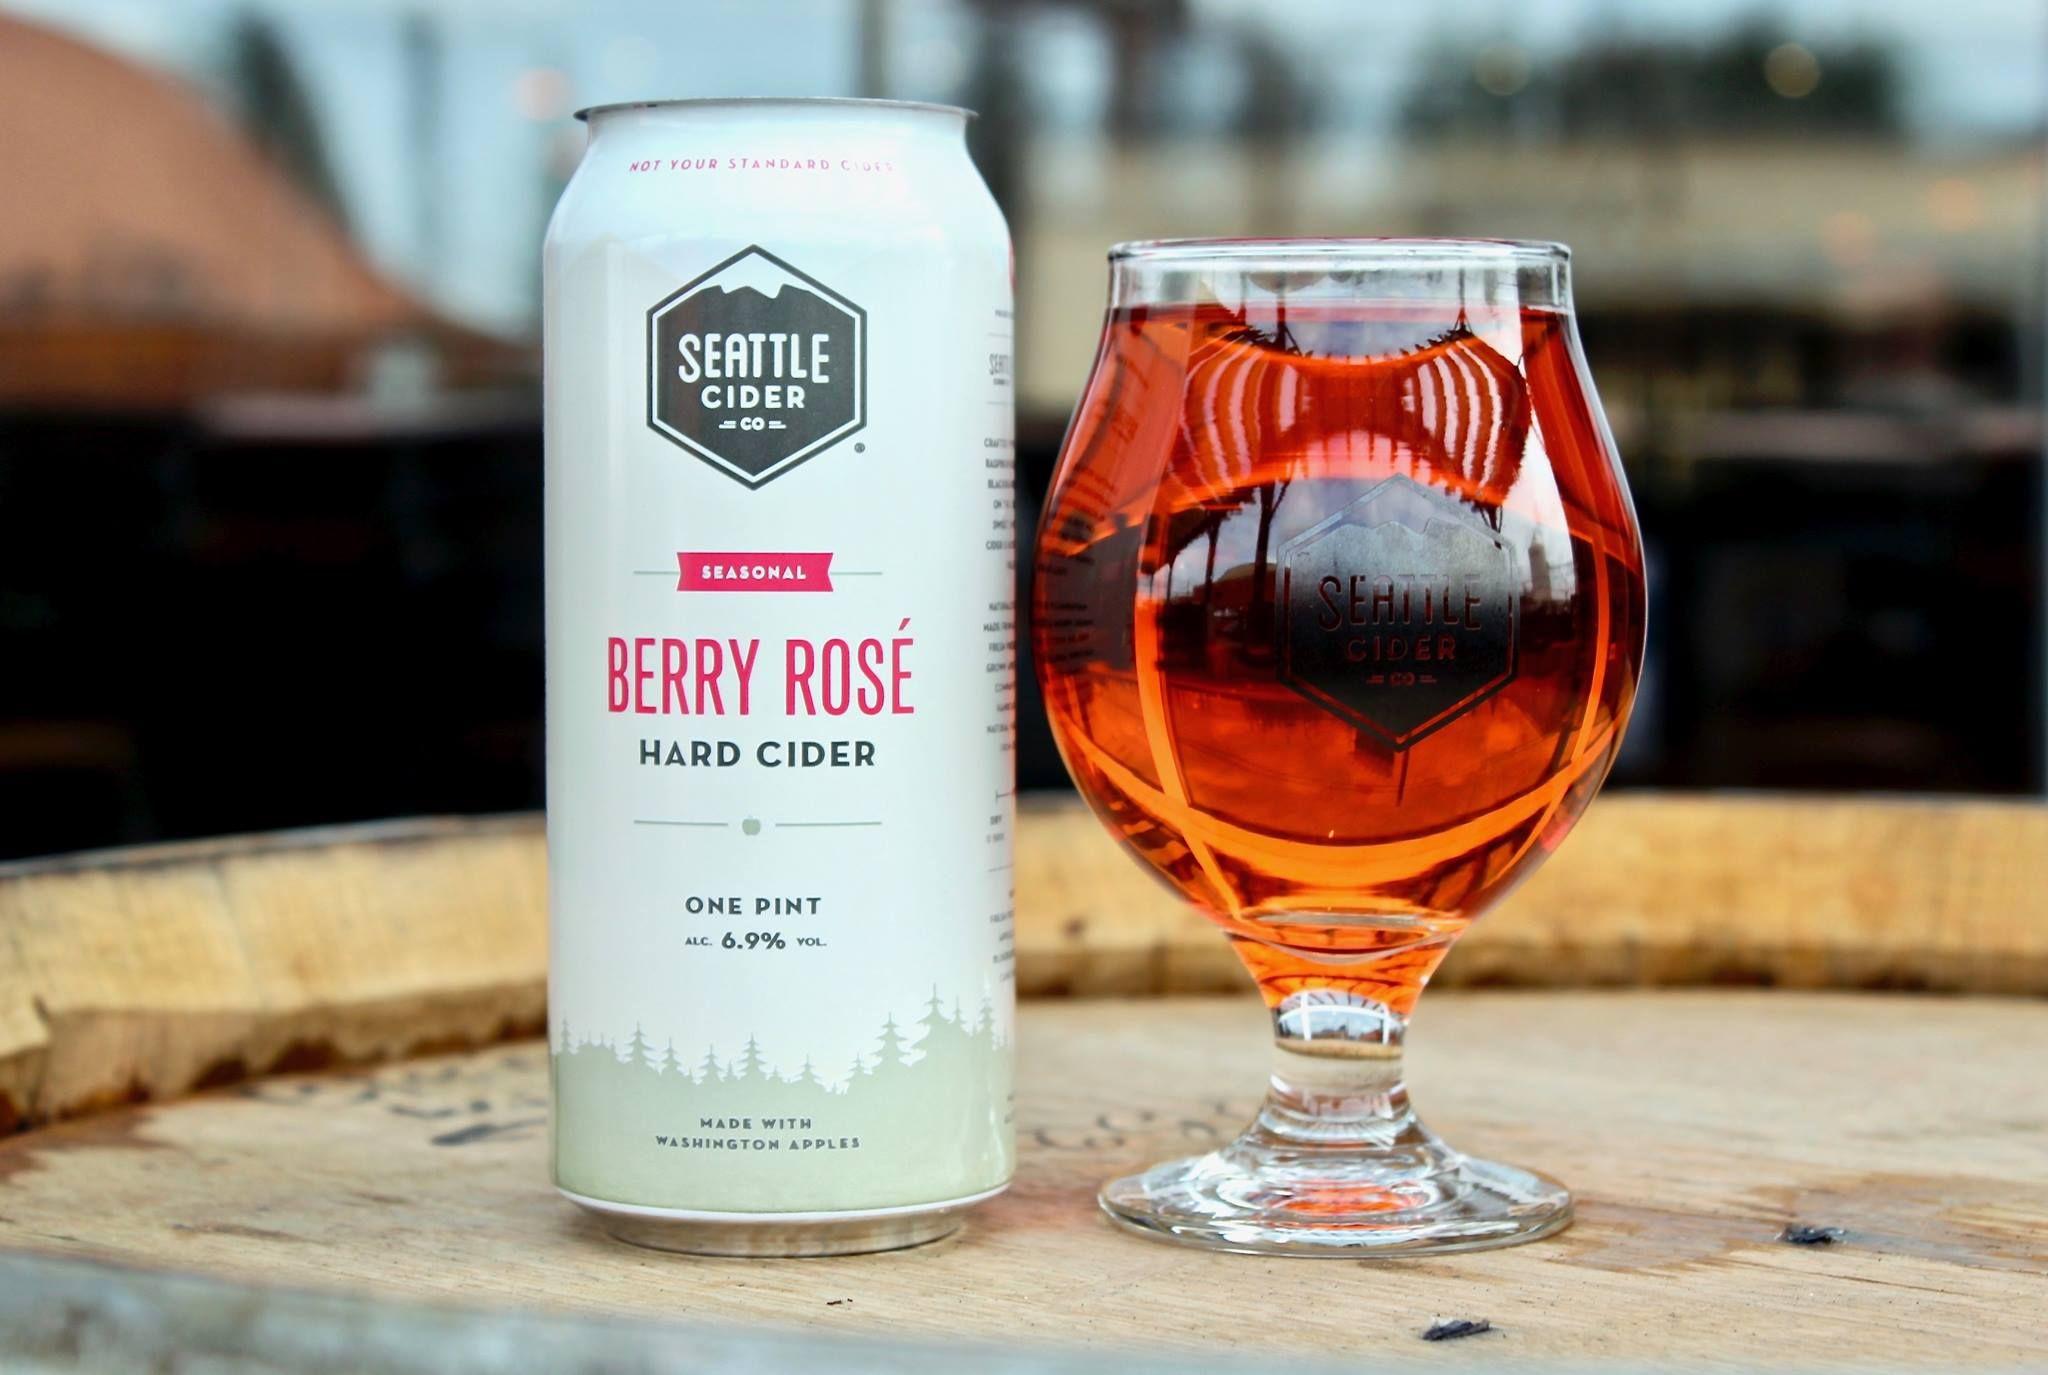 Fermented On Fresh Local Washington Blueberry Raspberry And Blackberry Juice And White Wine Yeast Berry Rose Is Slightly Tart On The Start And Sli Wine Yeast